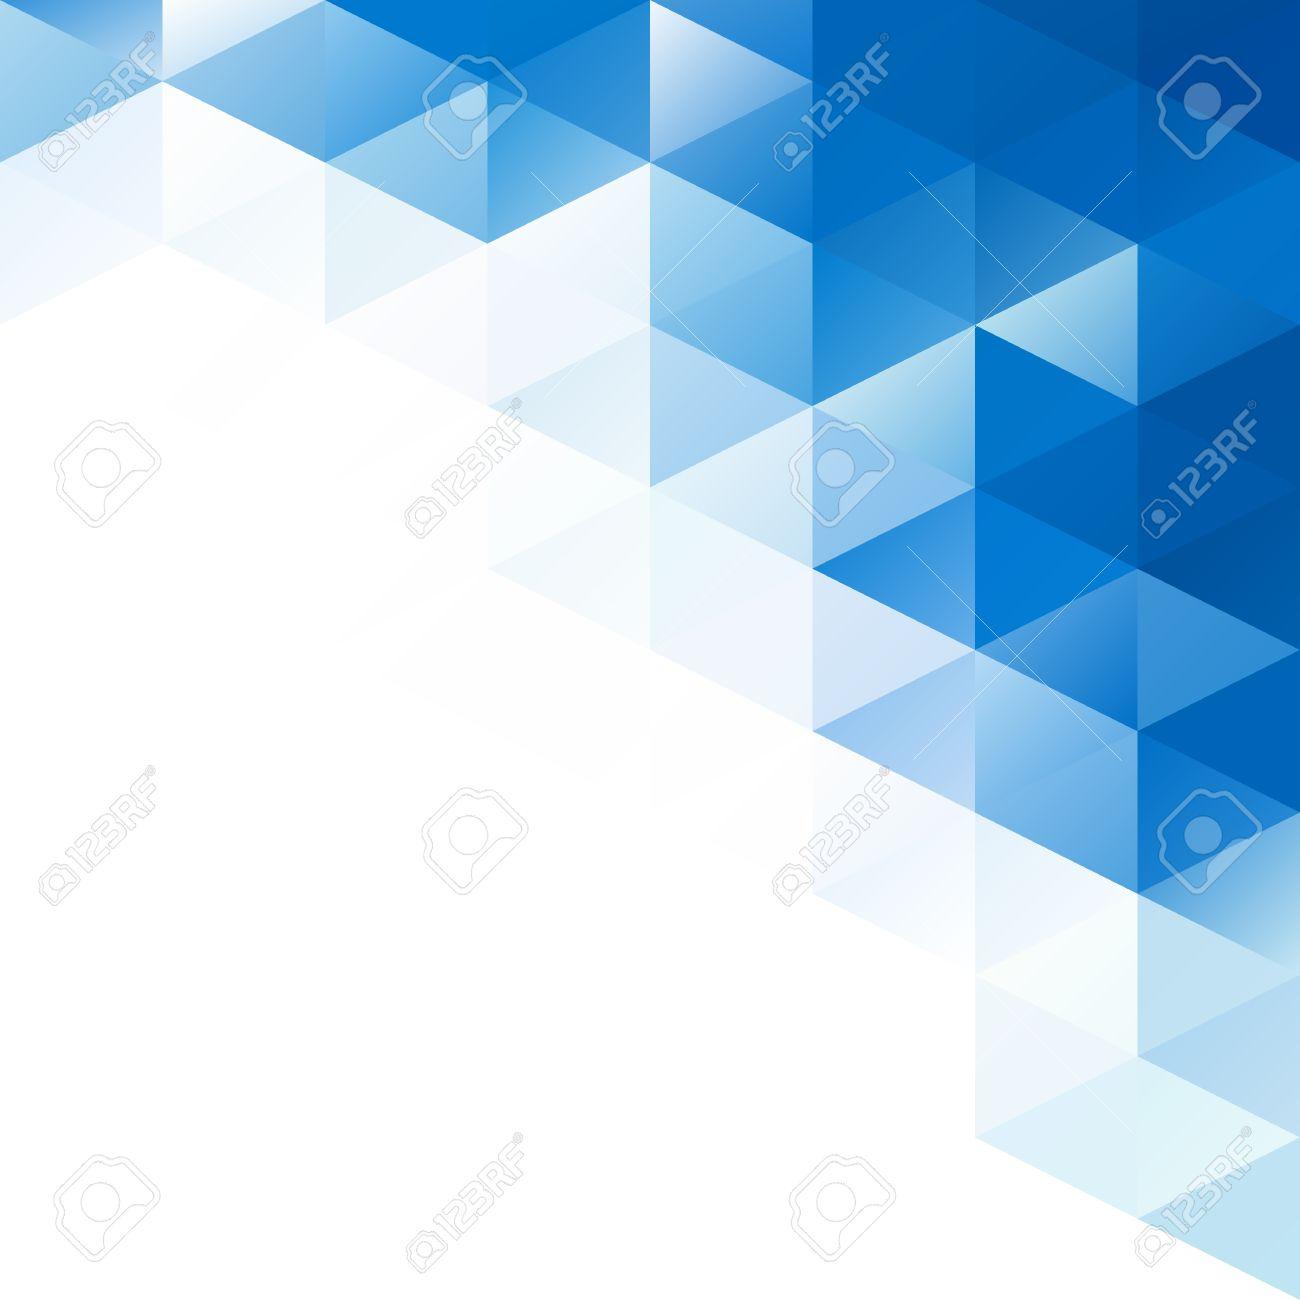 blue grid mosaic background creative design templates royalty